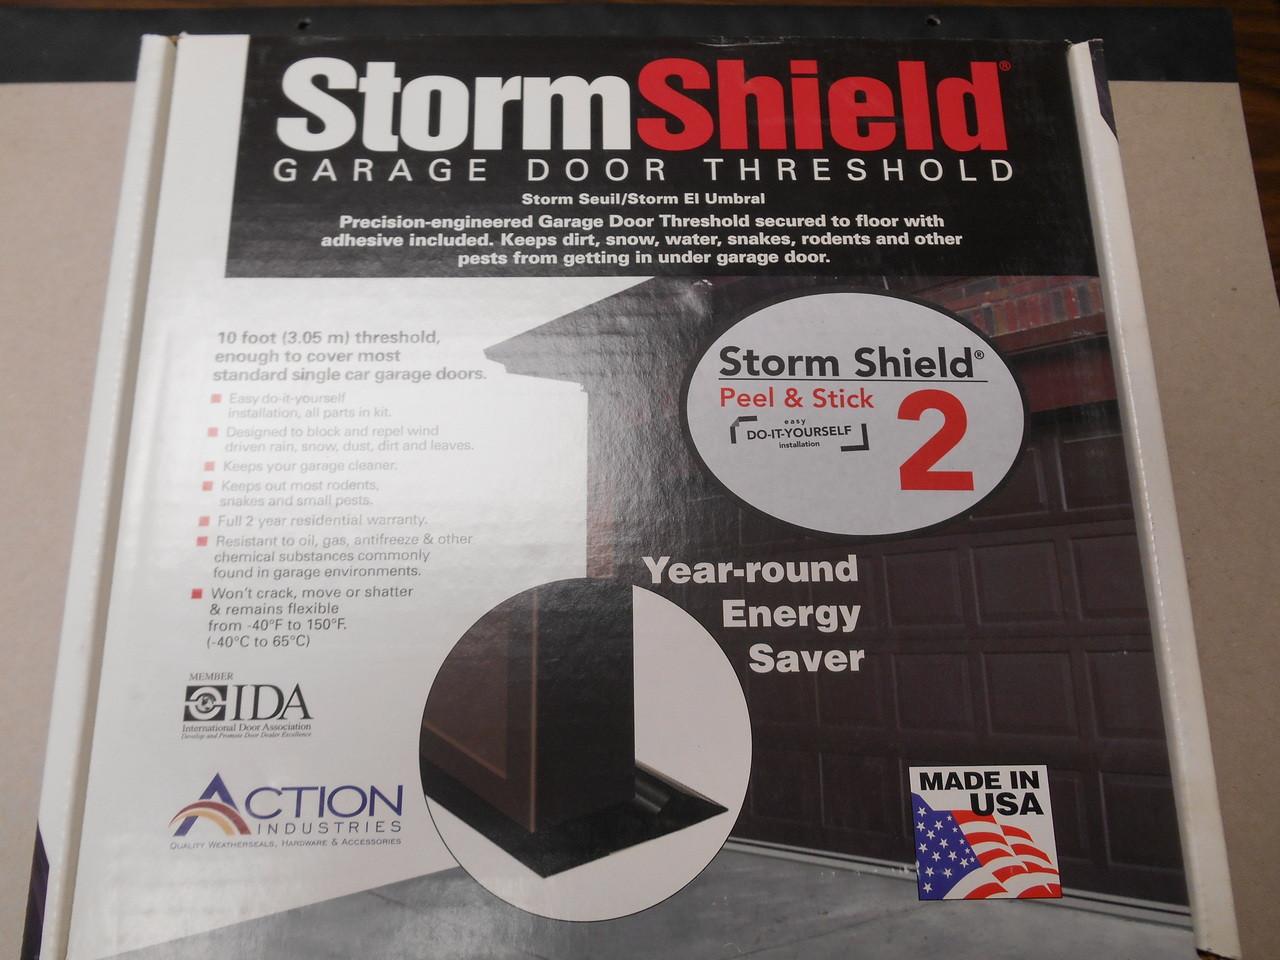 Storm Shield